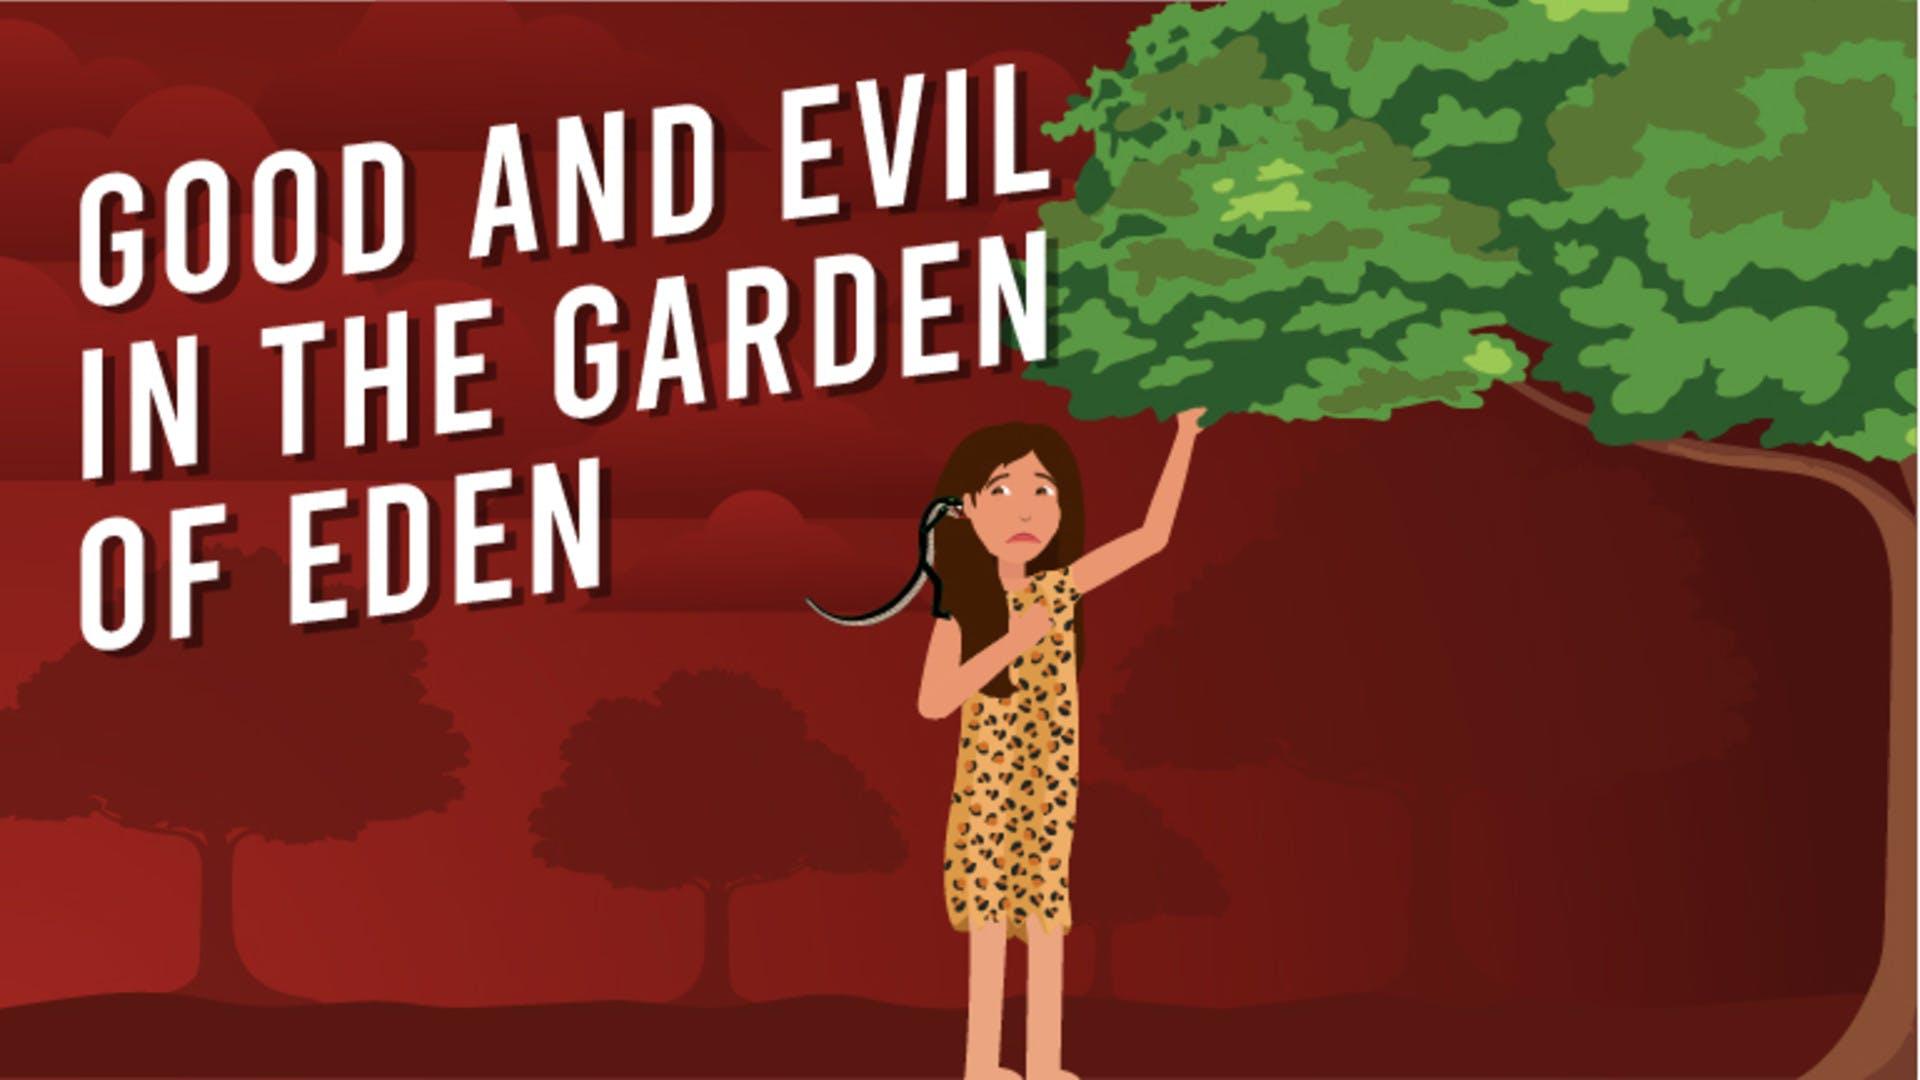 Two trees in the Garden of Eden